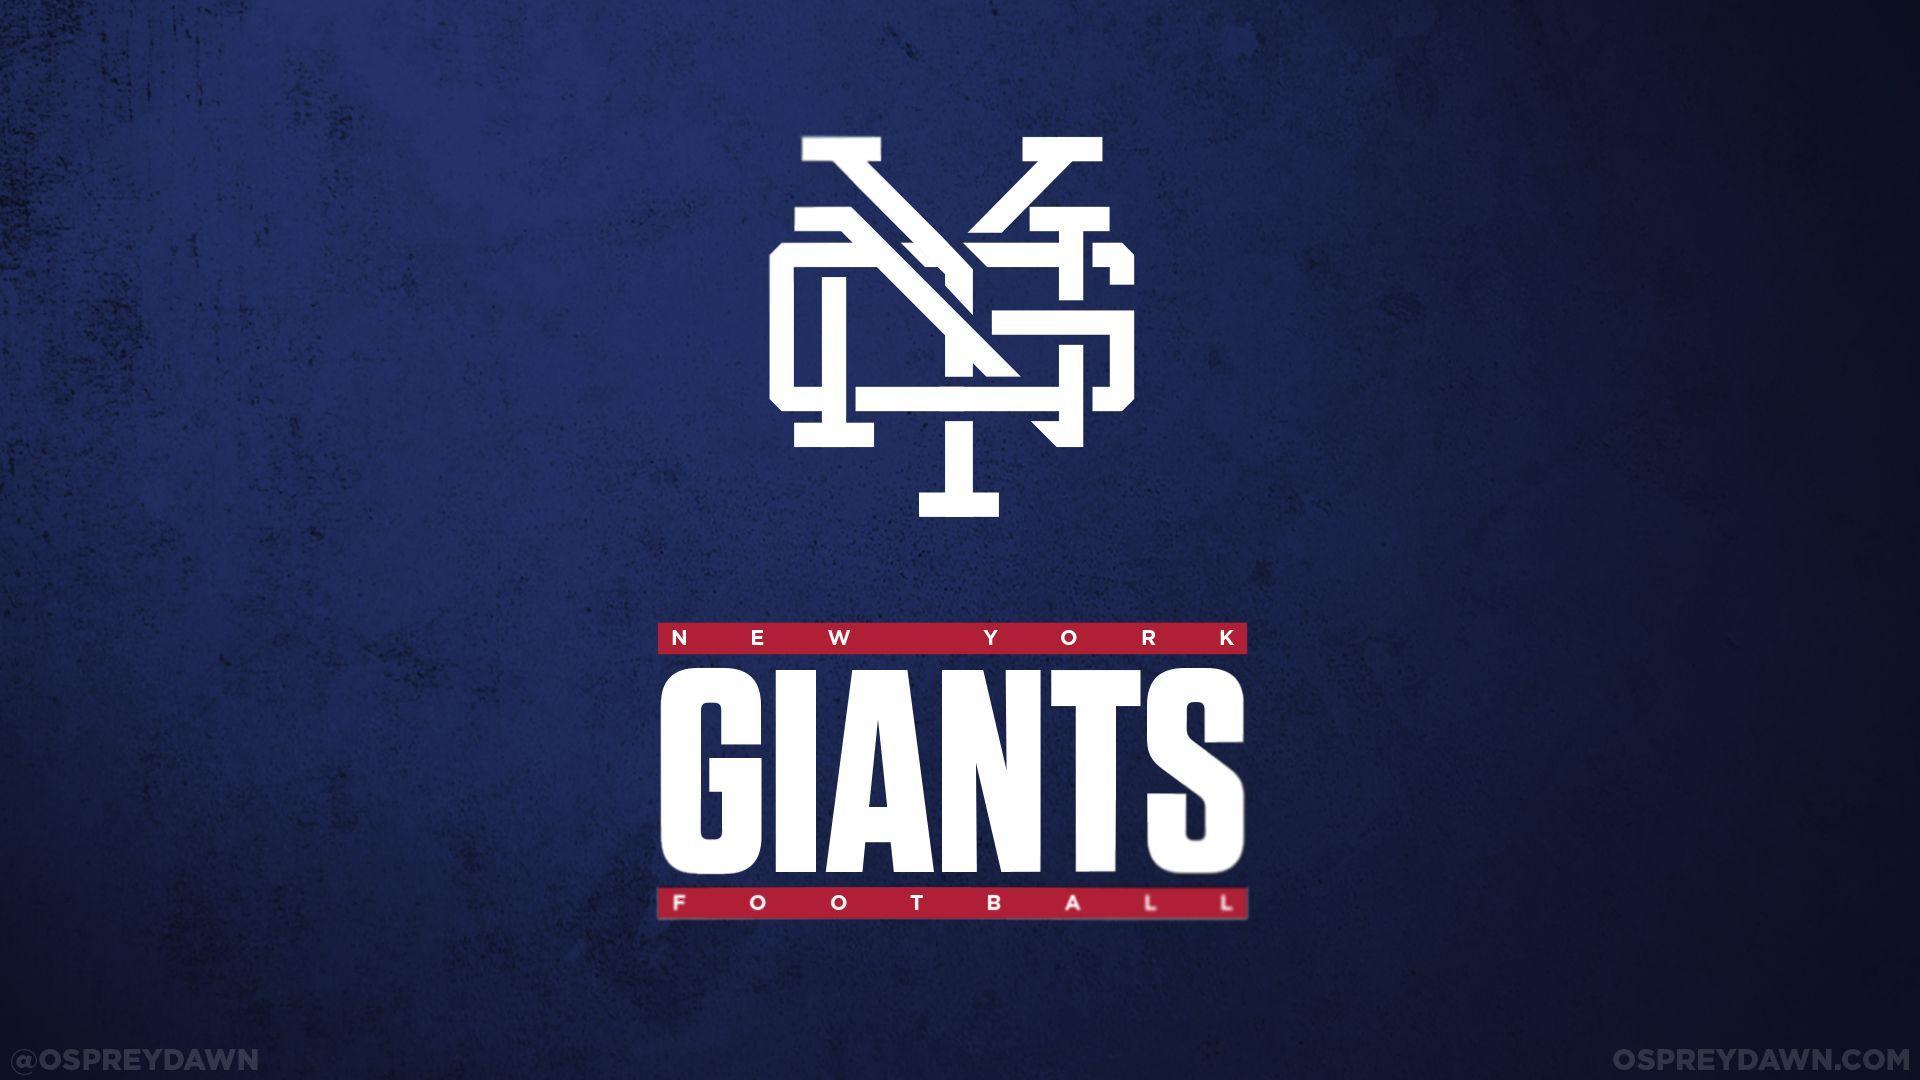 New York Giants Wallpapers Wallpaper Cave HD Wallpapers Download Free Images Wallpaper [1000image.com]